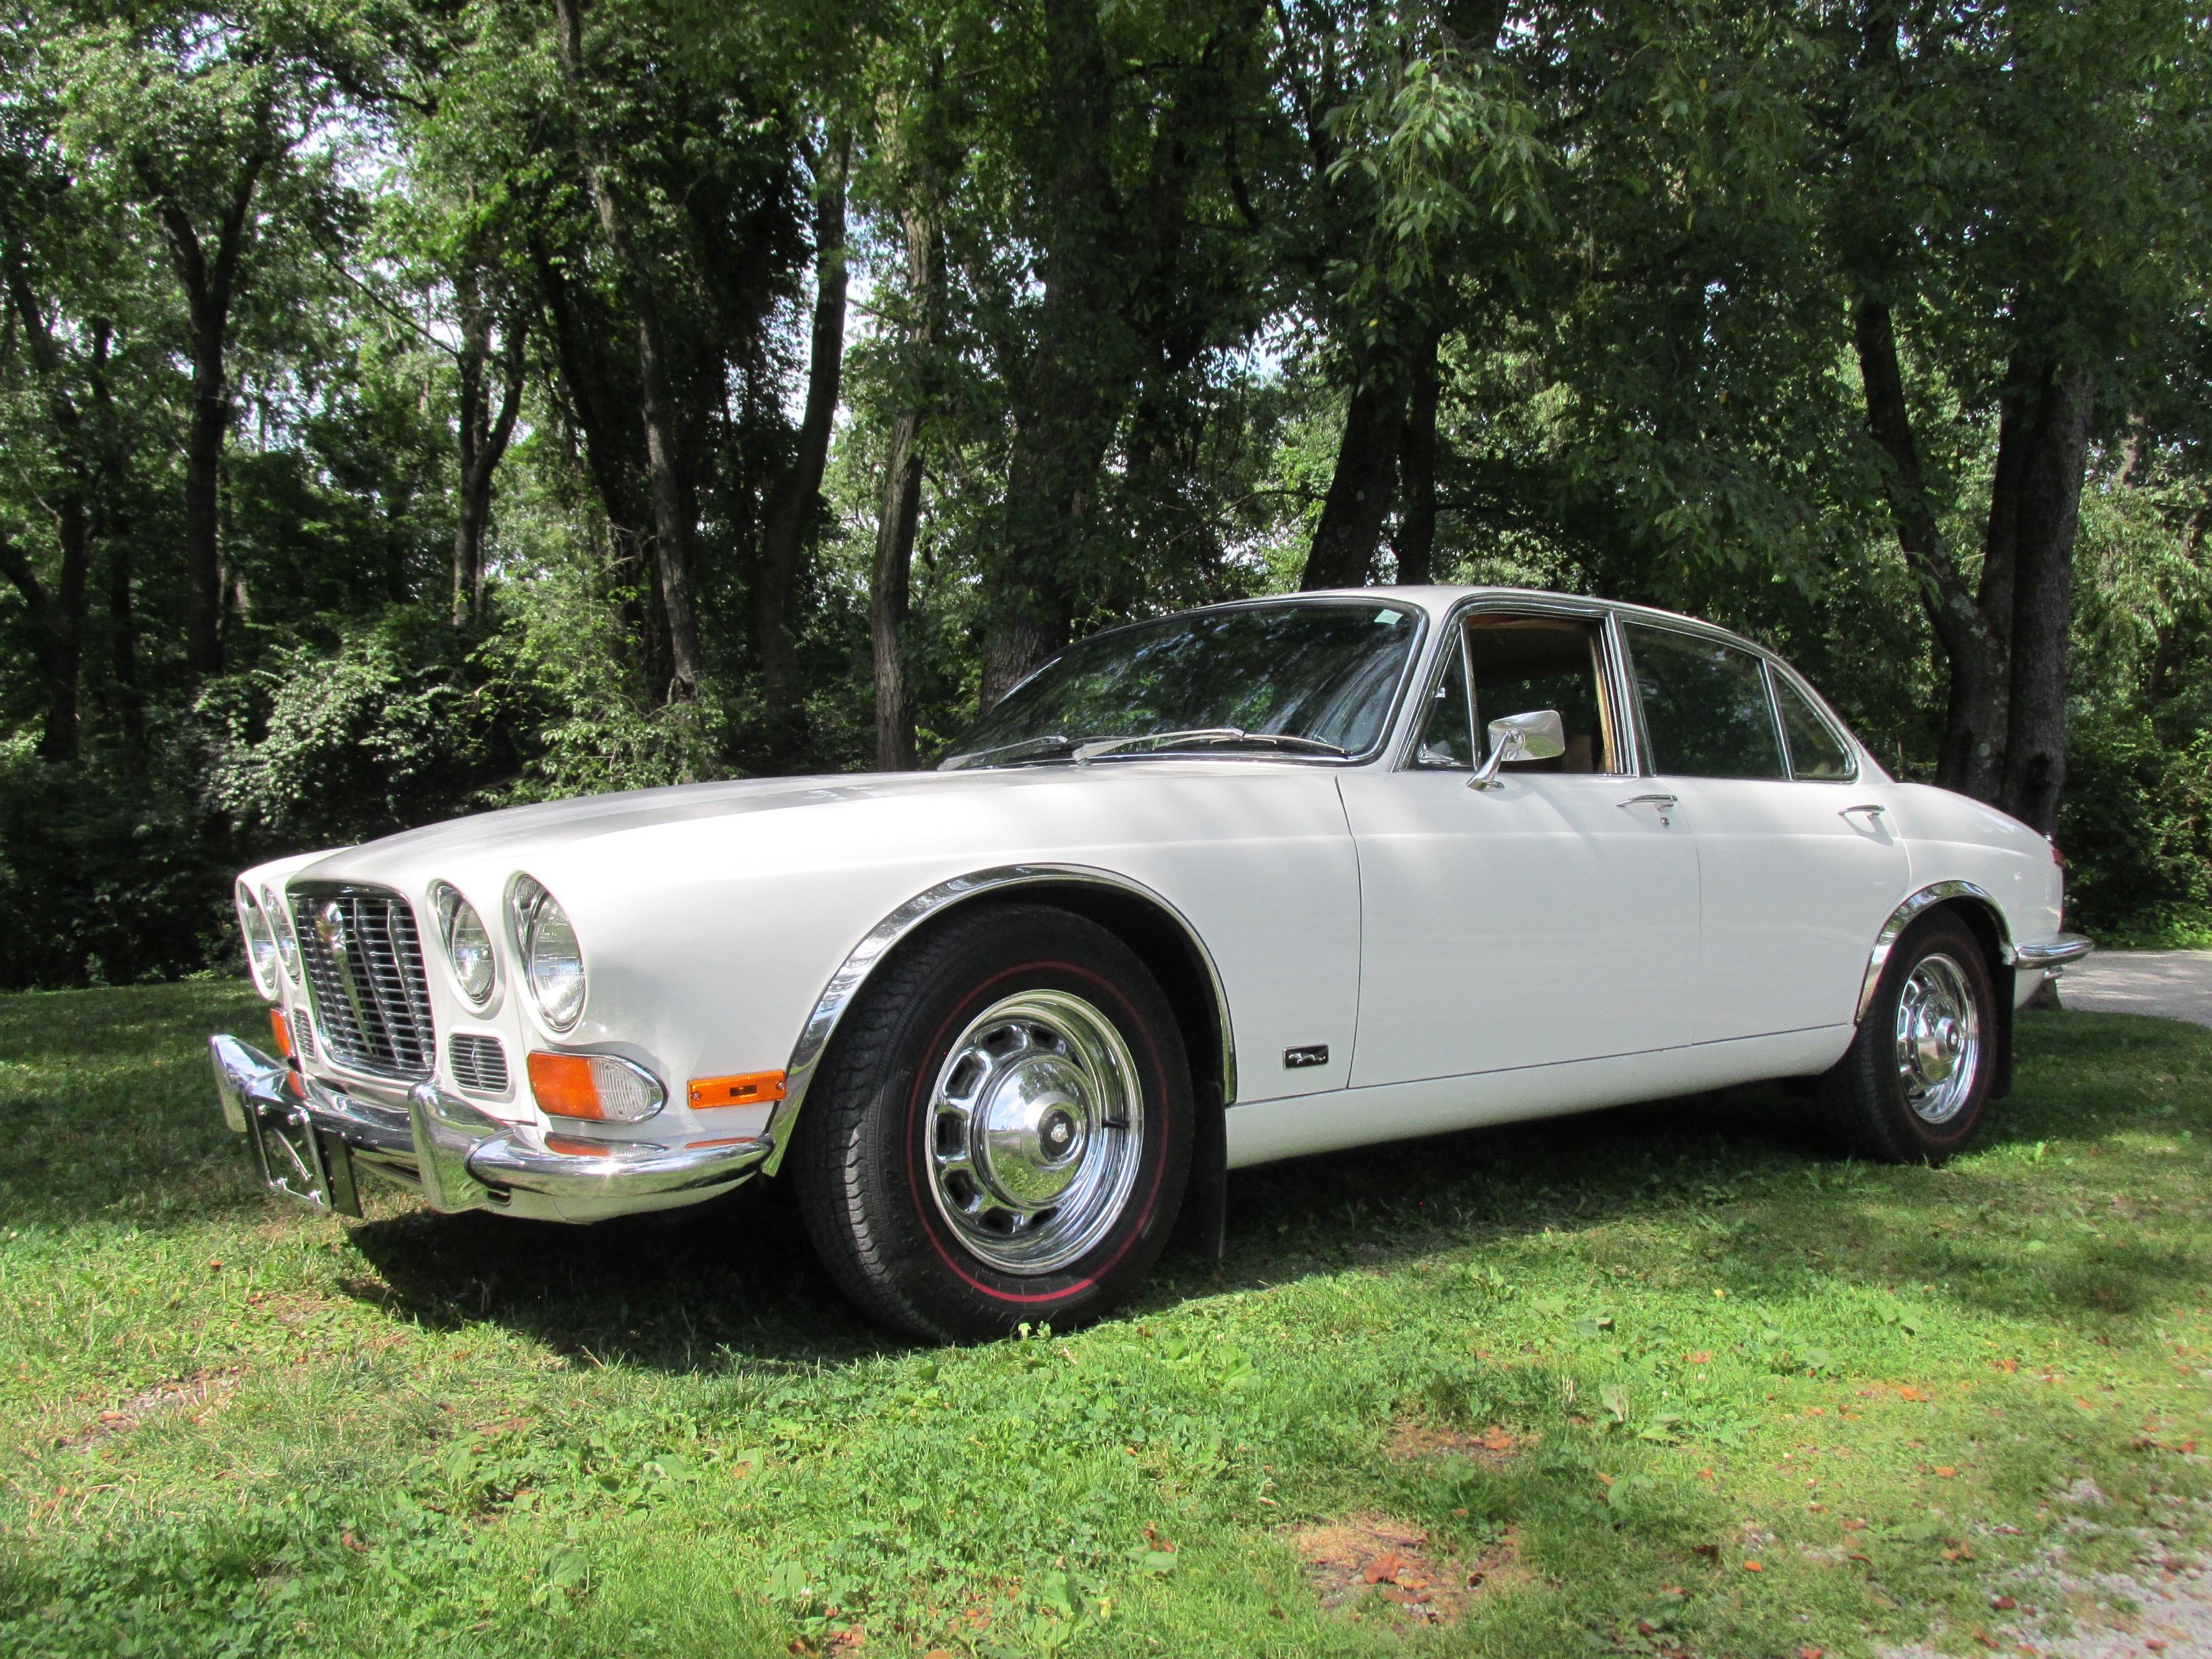 1971 Jaguar XJ6 - Fort Pitt Classic Cars